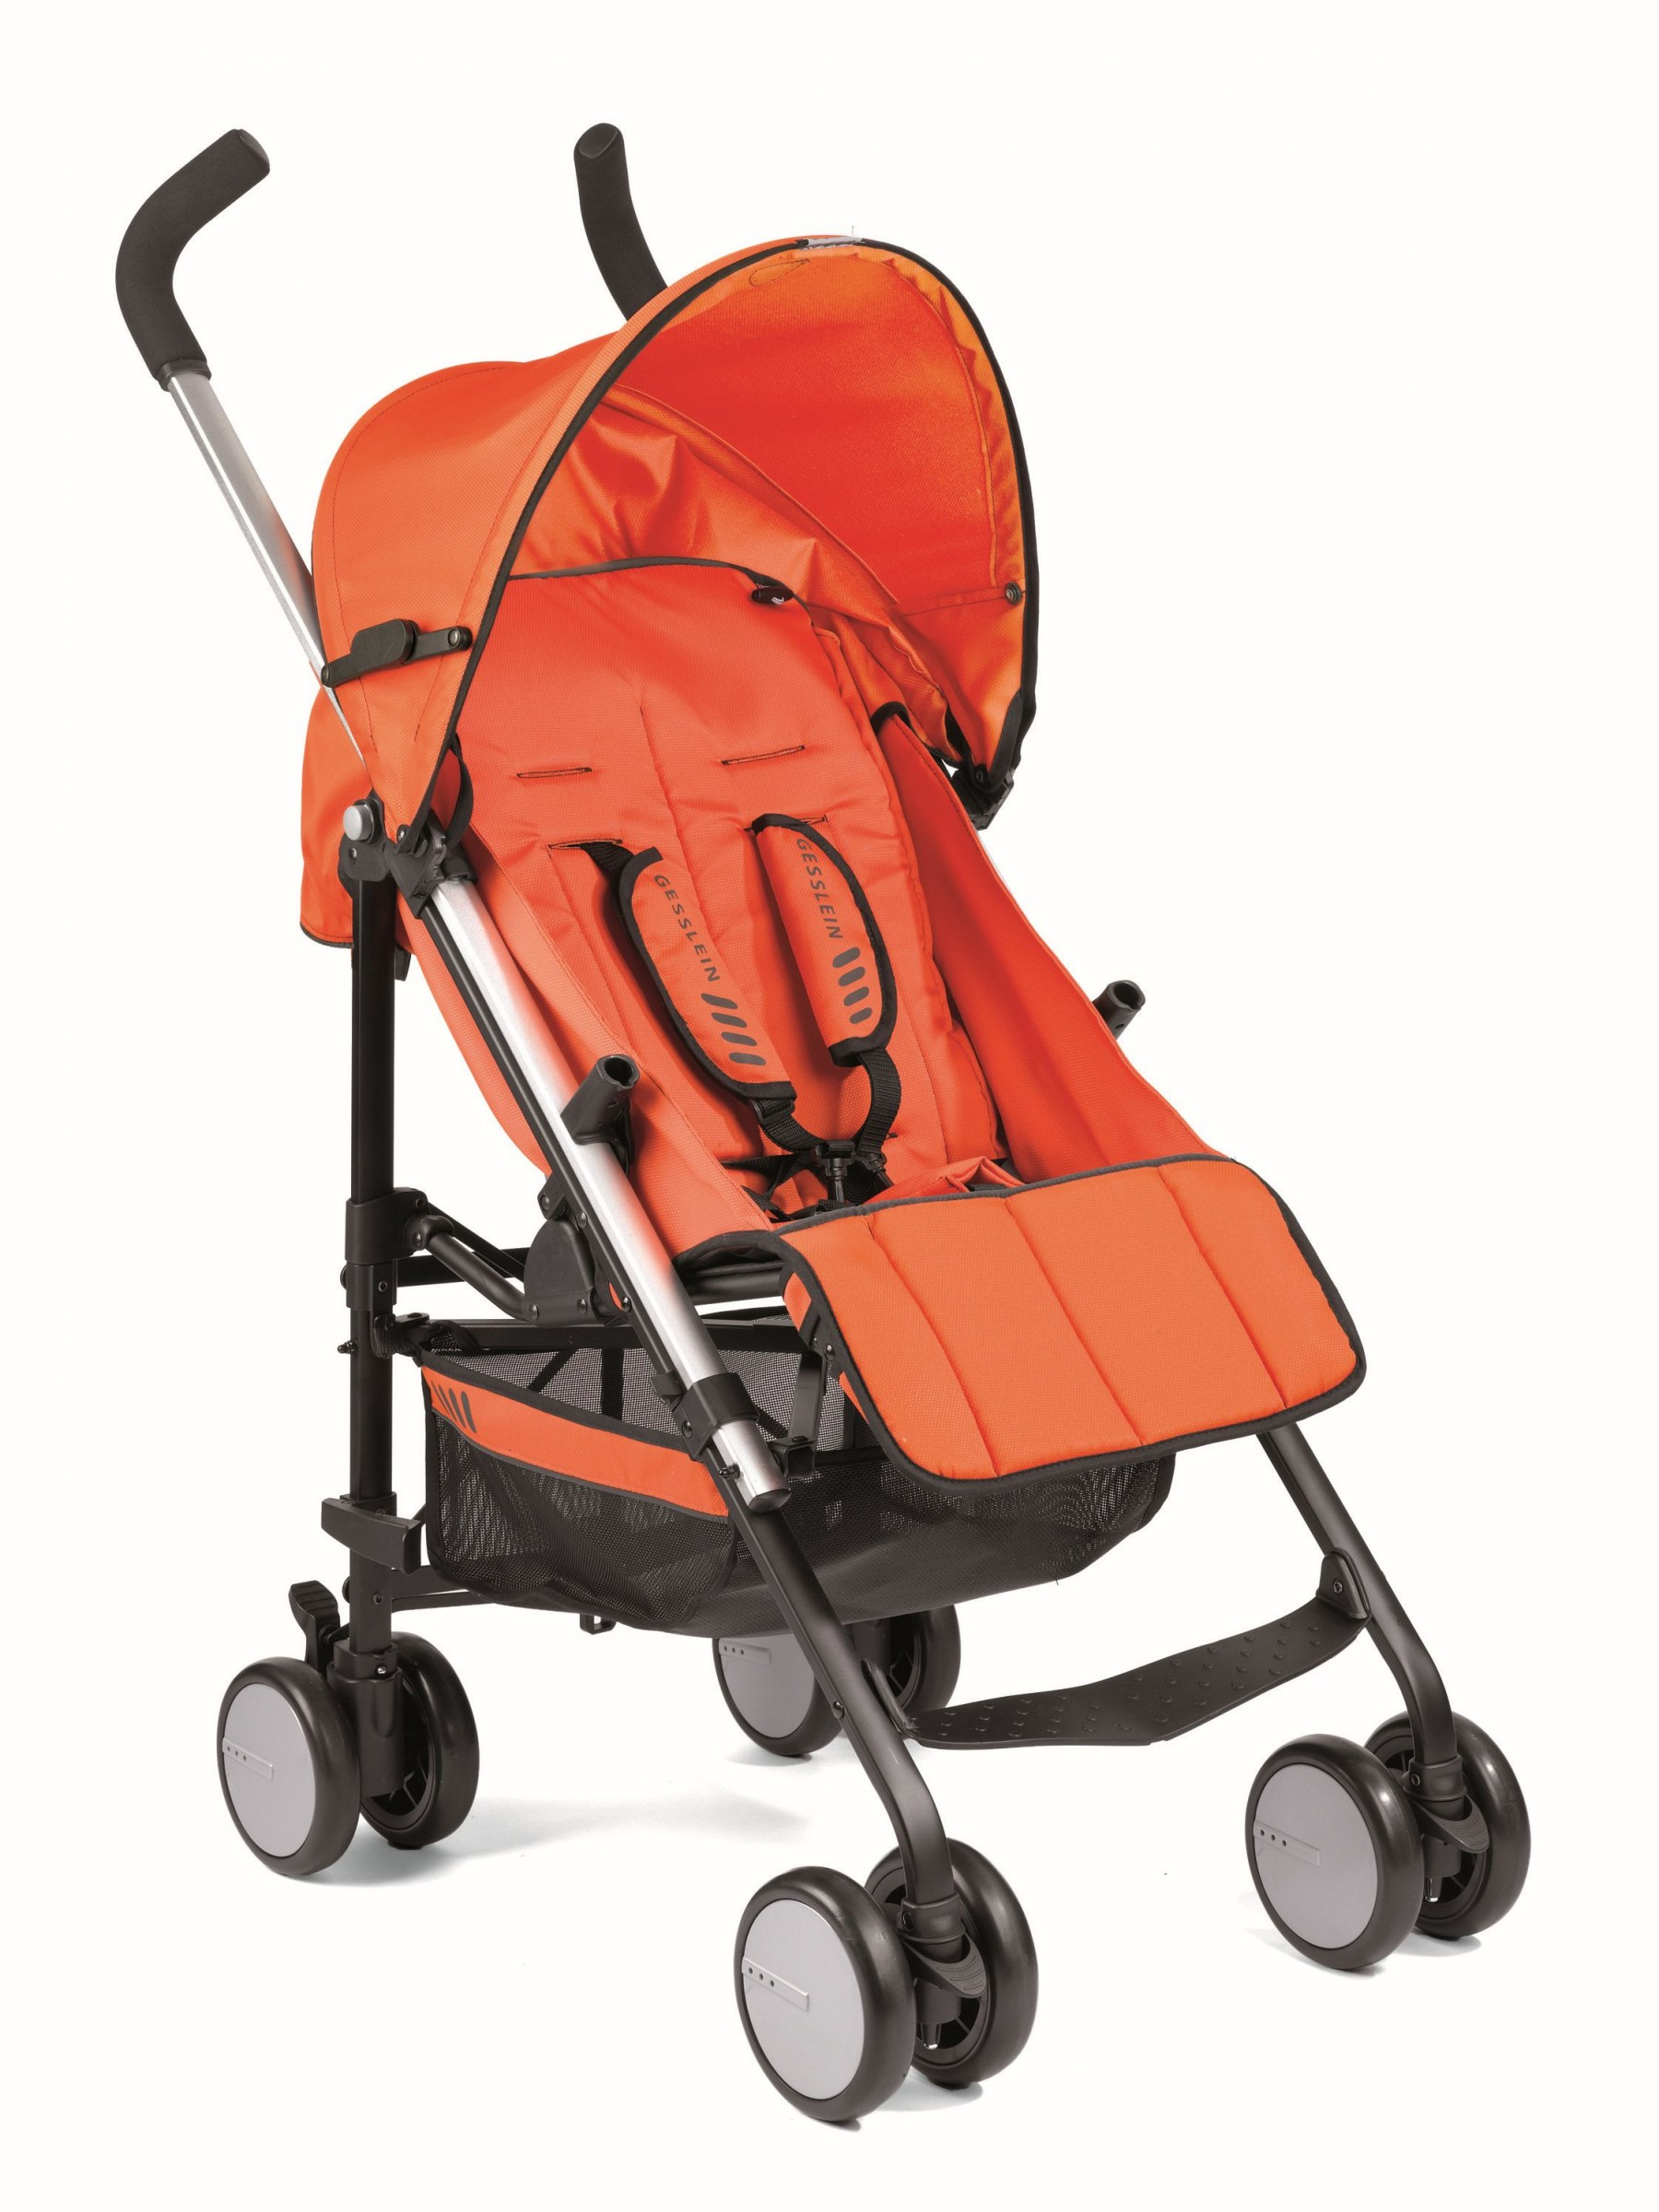 Gesslein Buggy Reisebuggy S5 Sport orange 4x4